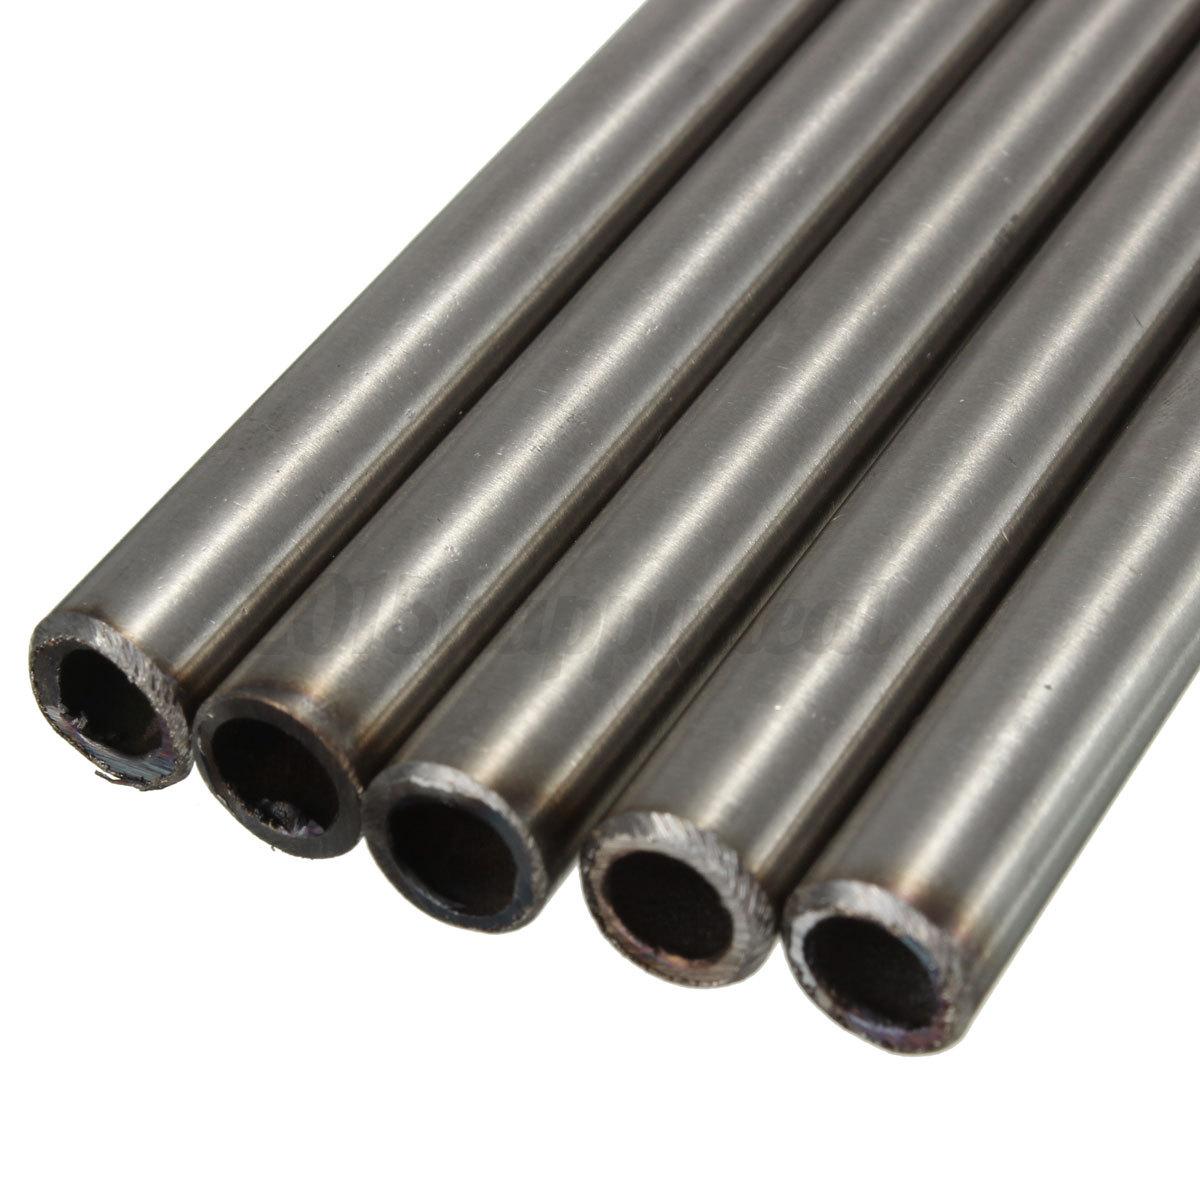 Stainless steel capillary round tube bar od mm